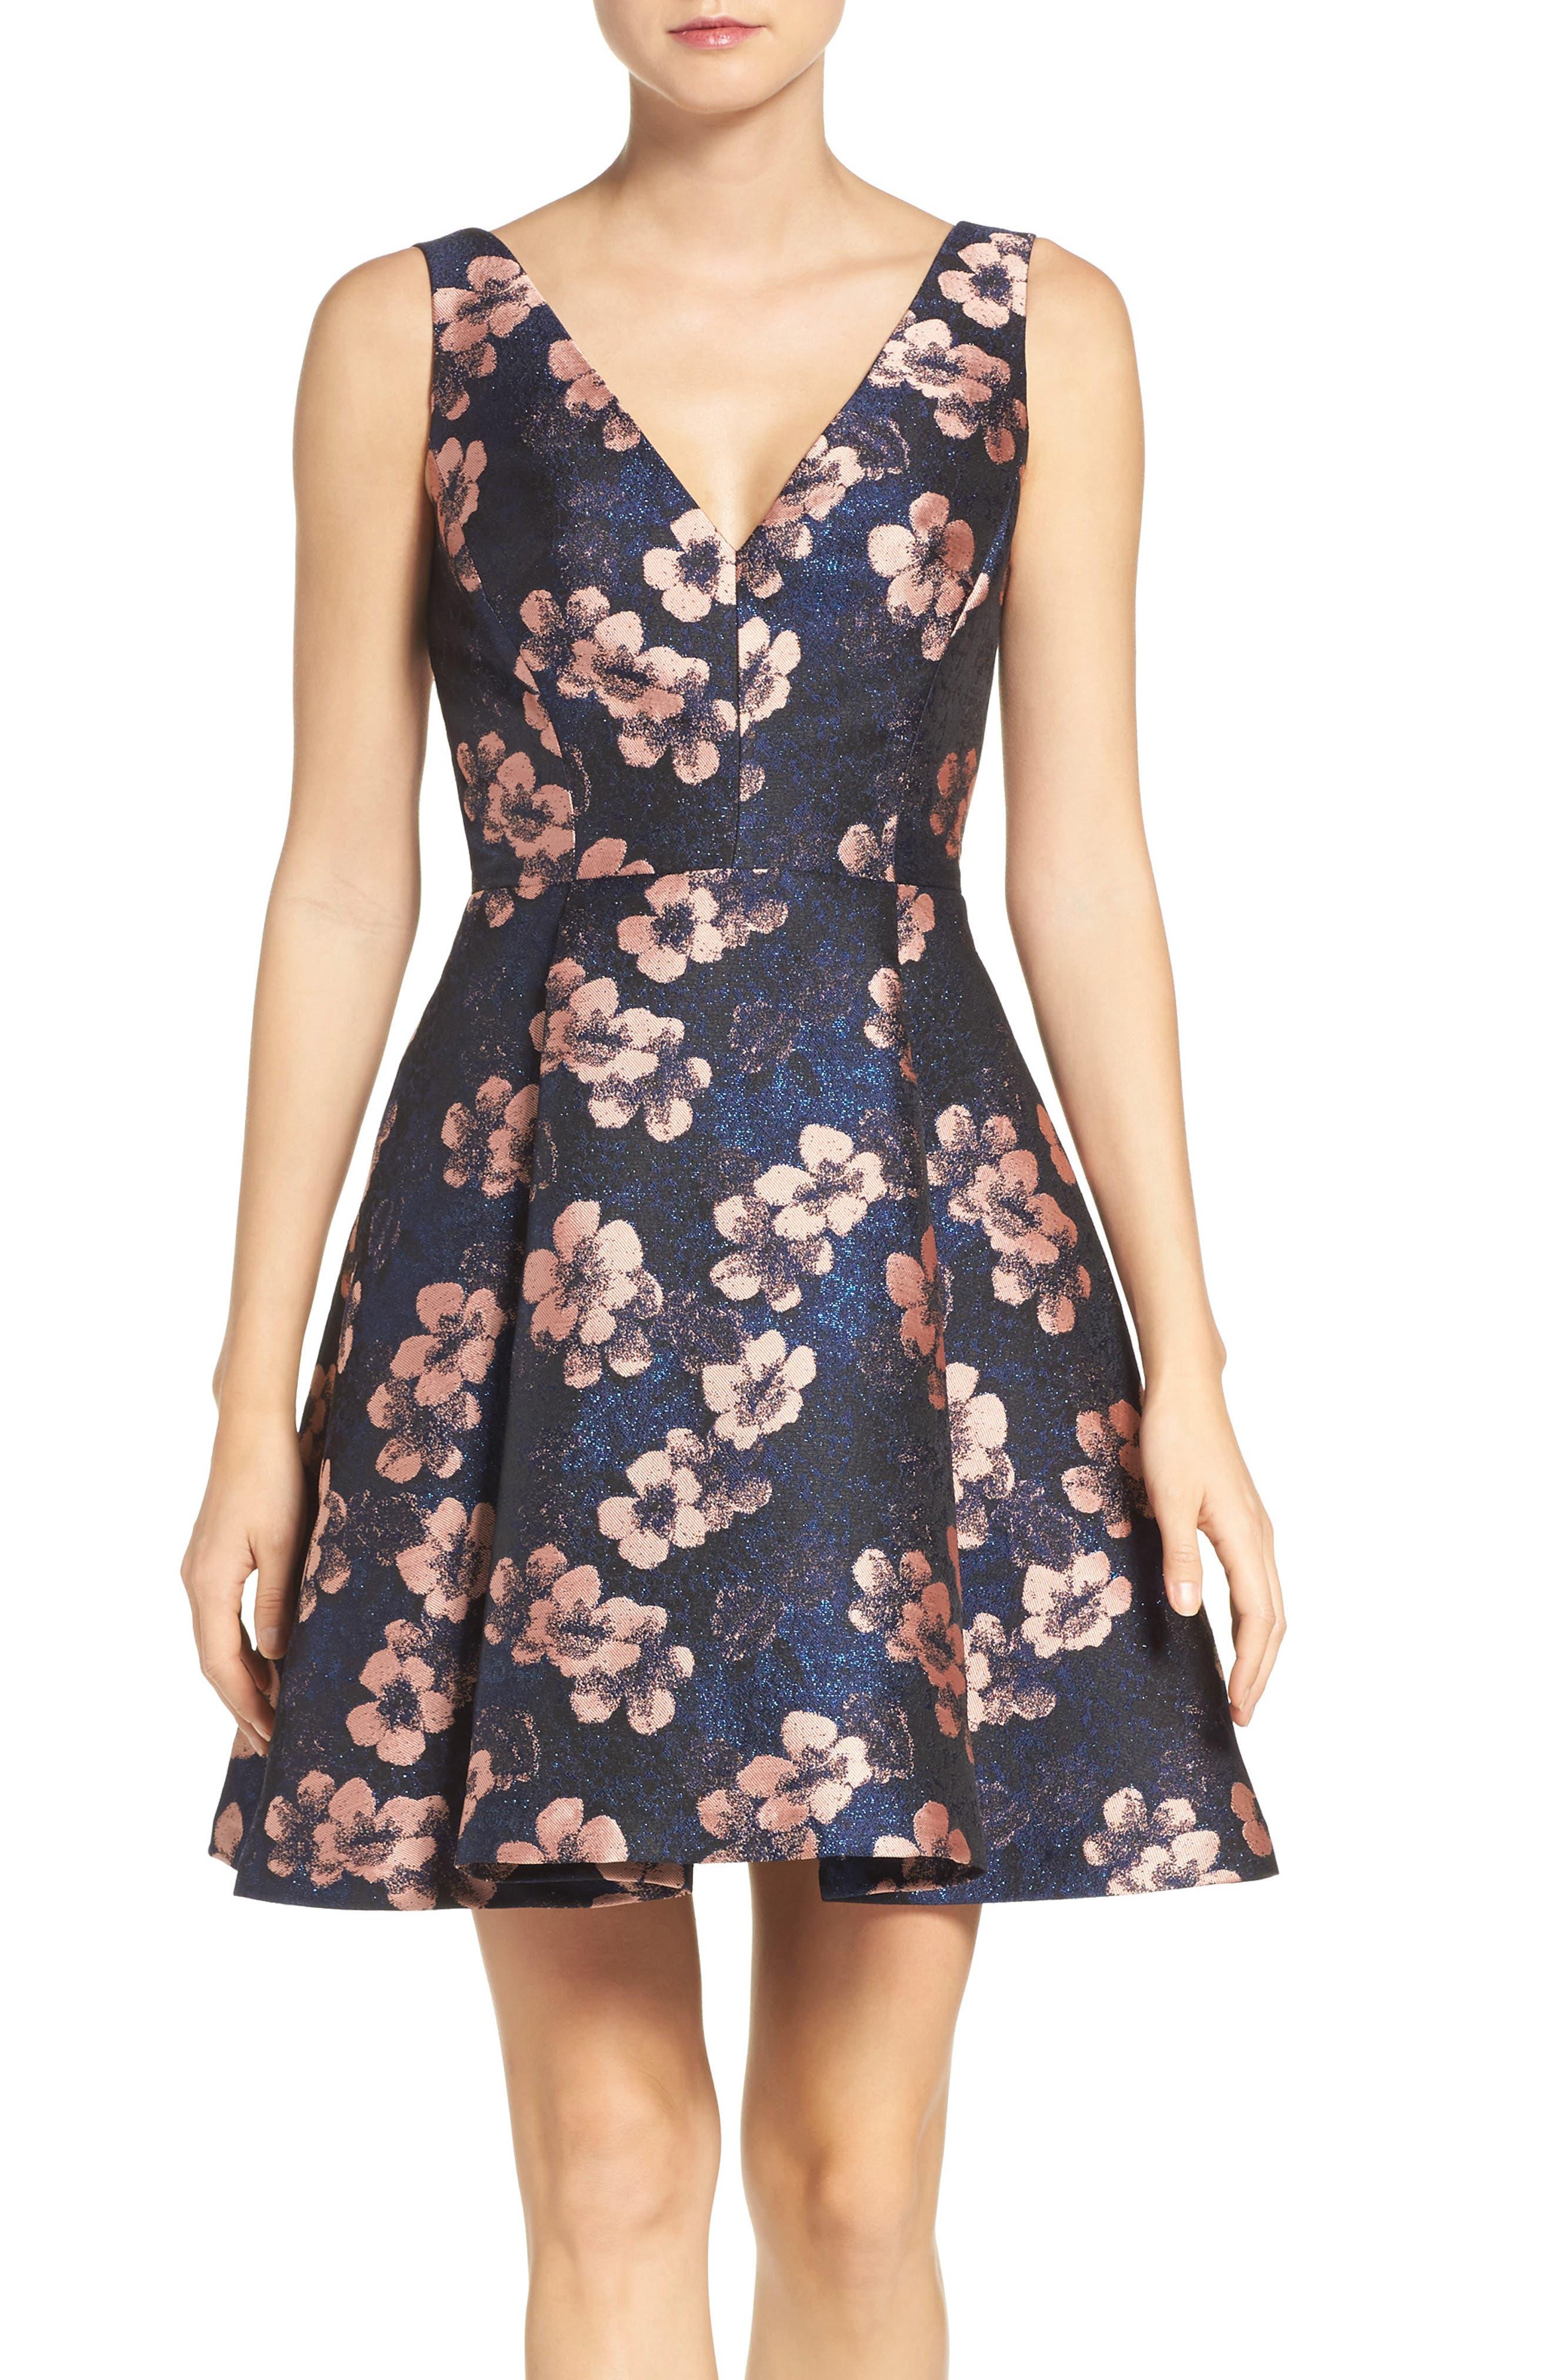 Alternate Image 1 Selected - Betsey Johnson Metallic Jacquard Fit & Flare Dress